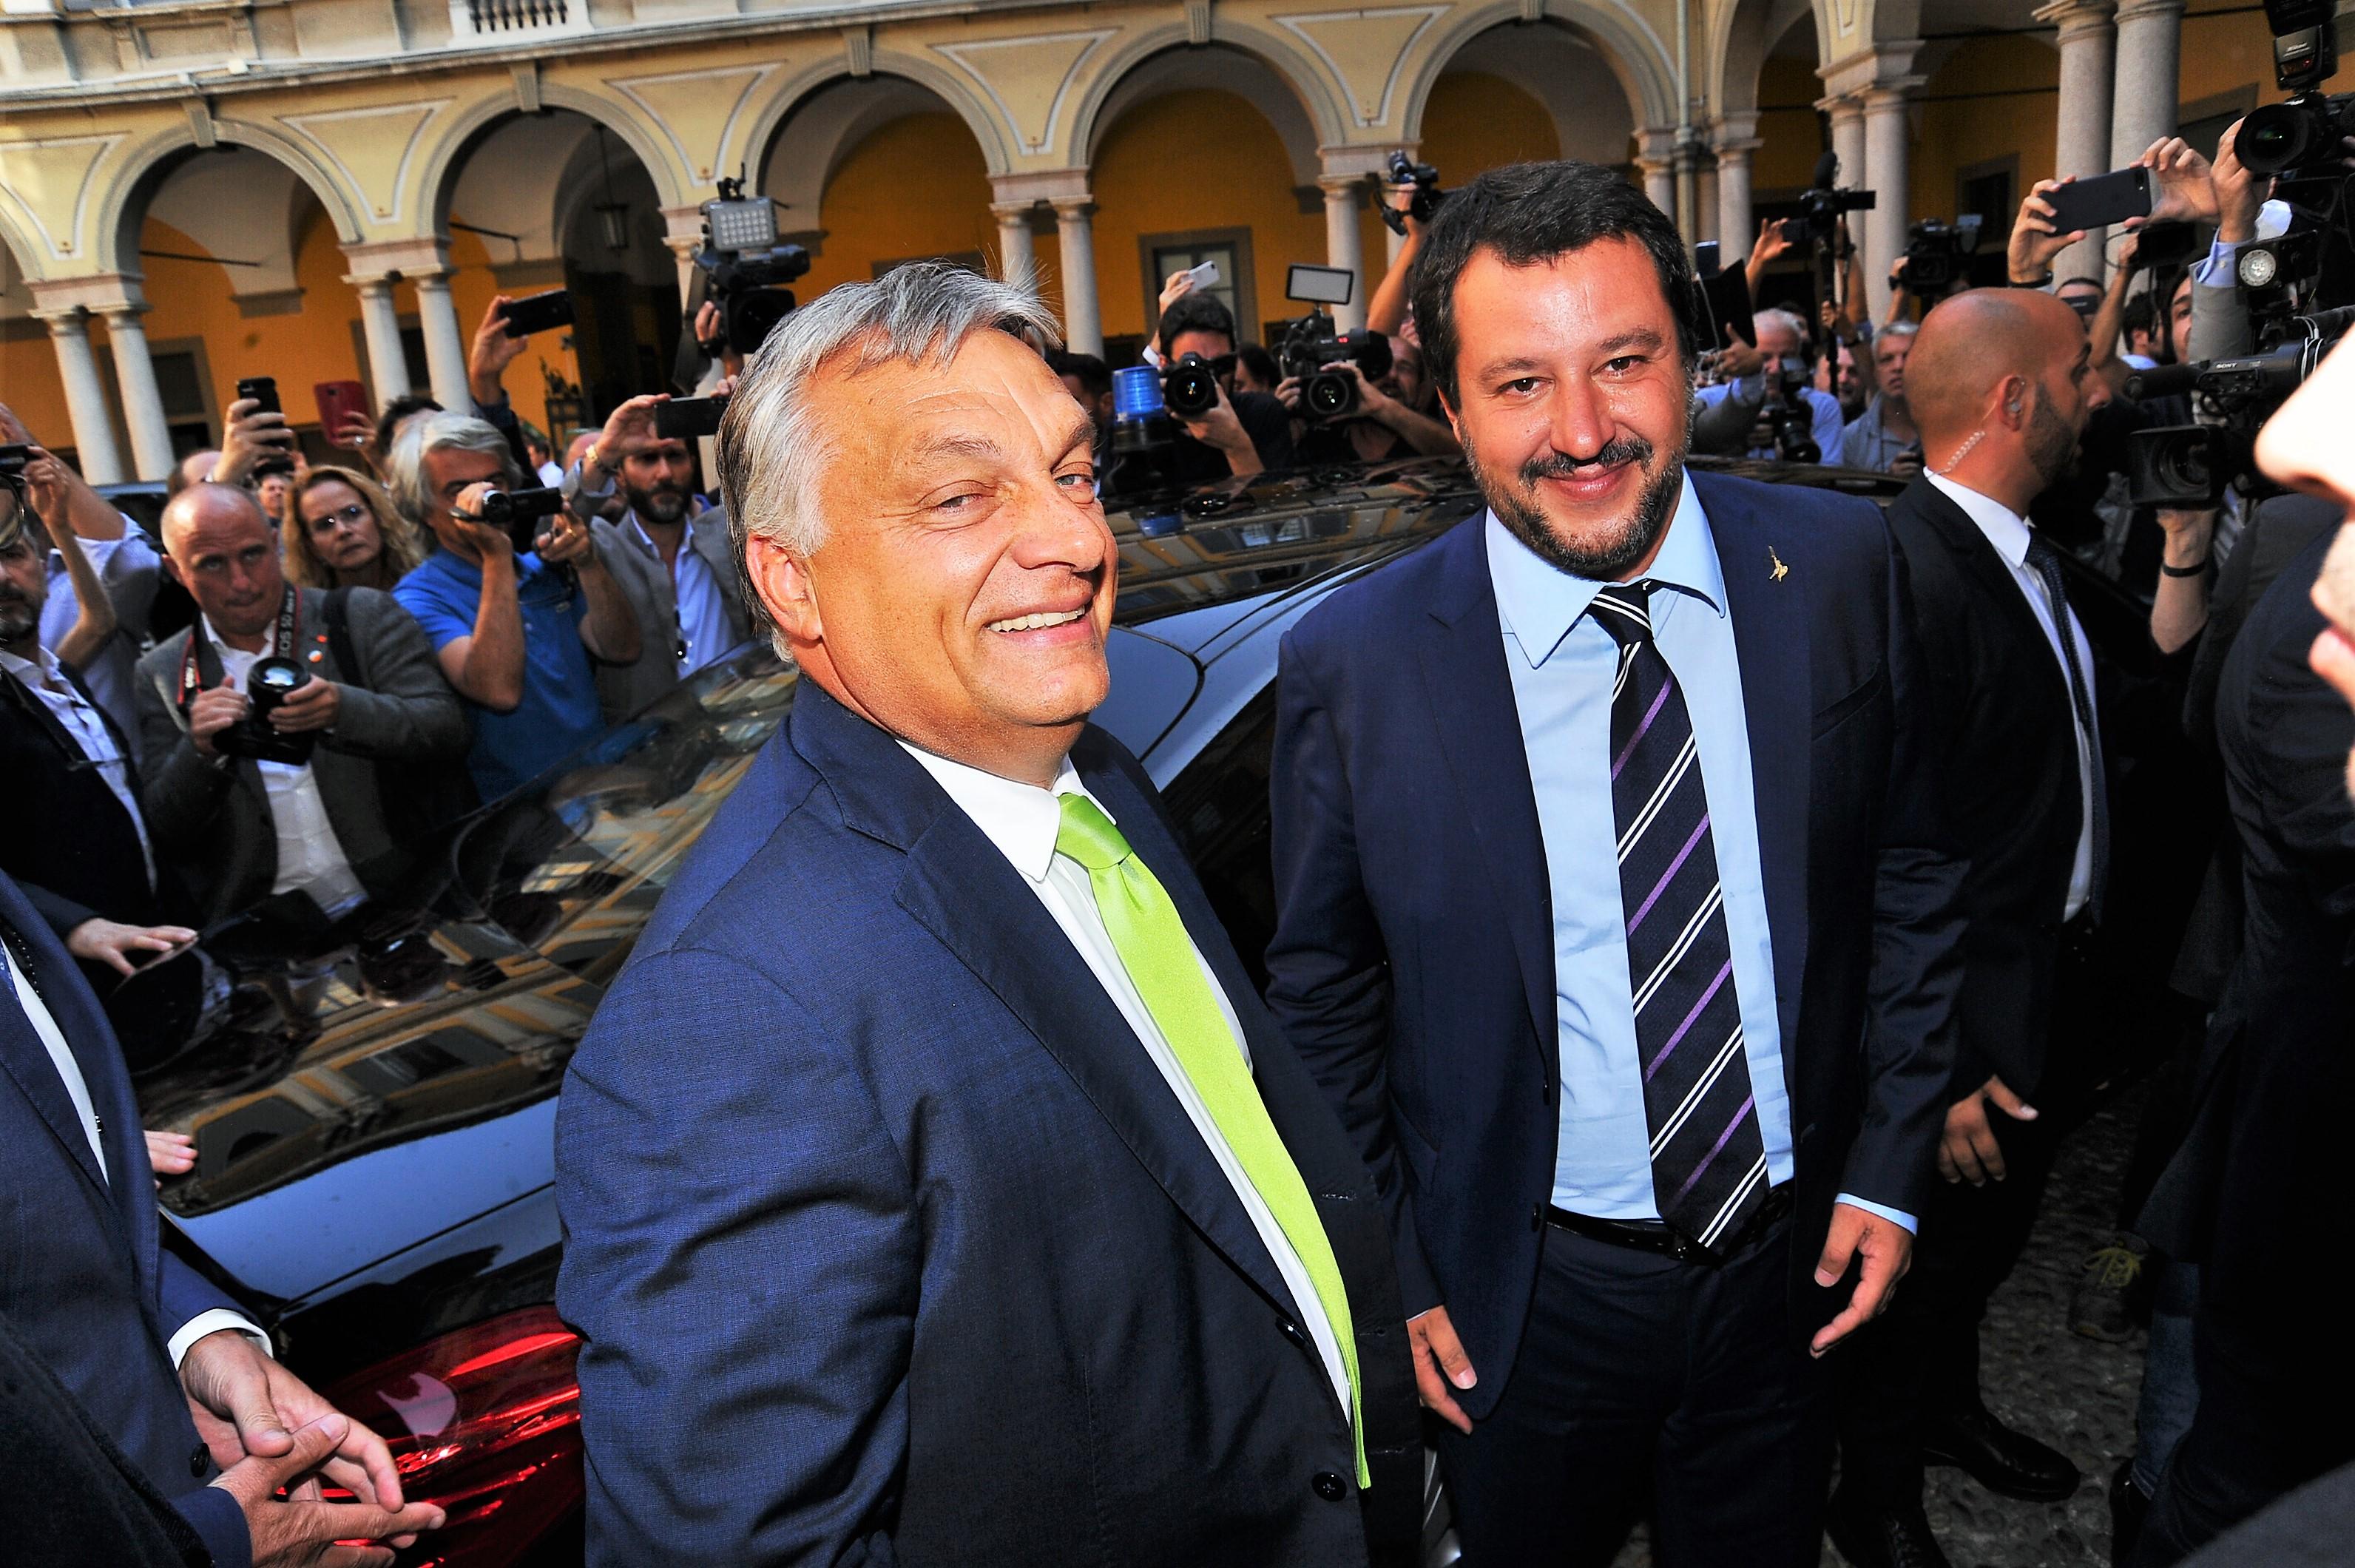 La Lega guarda a Orban, verso kermesse populisti a Varsavia. C'è pure Putin